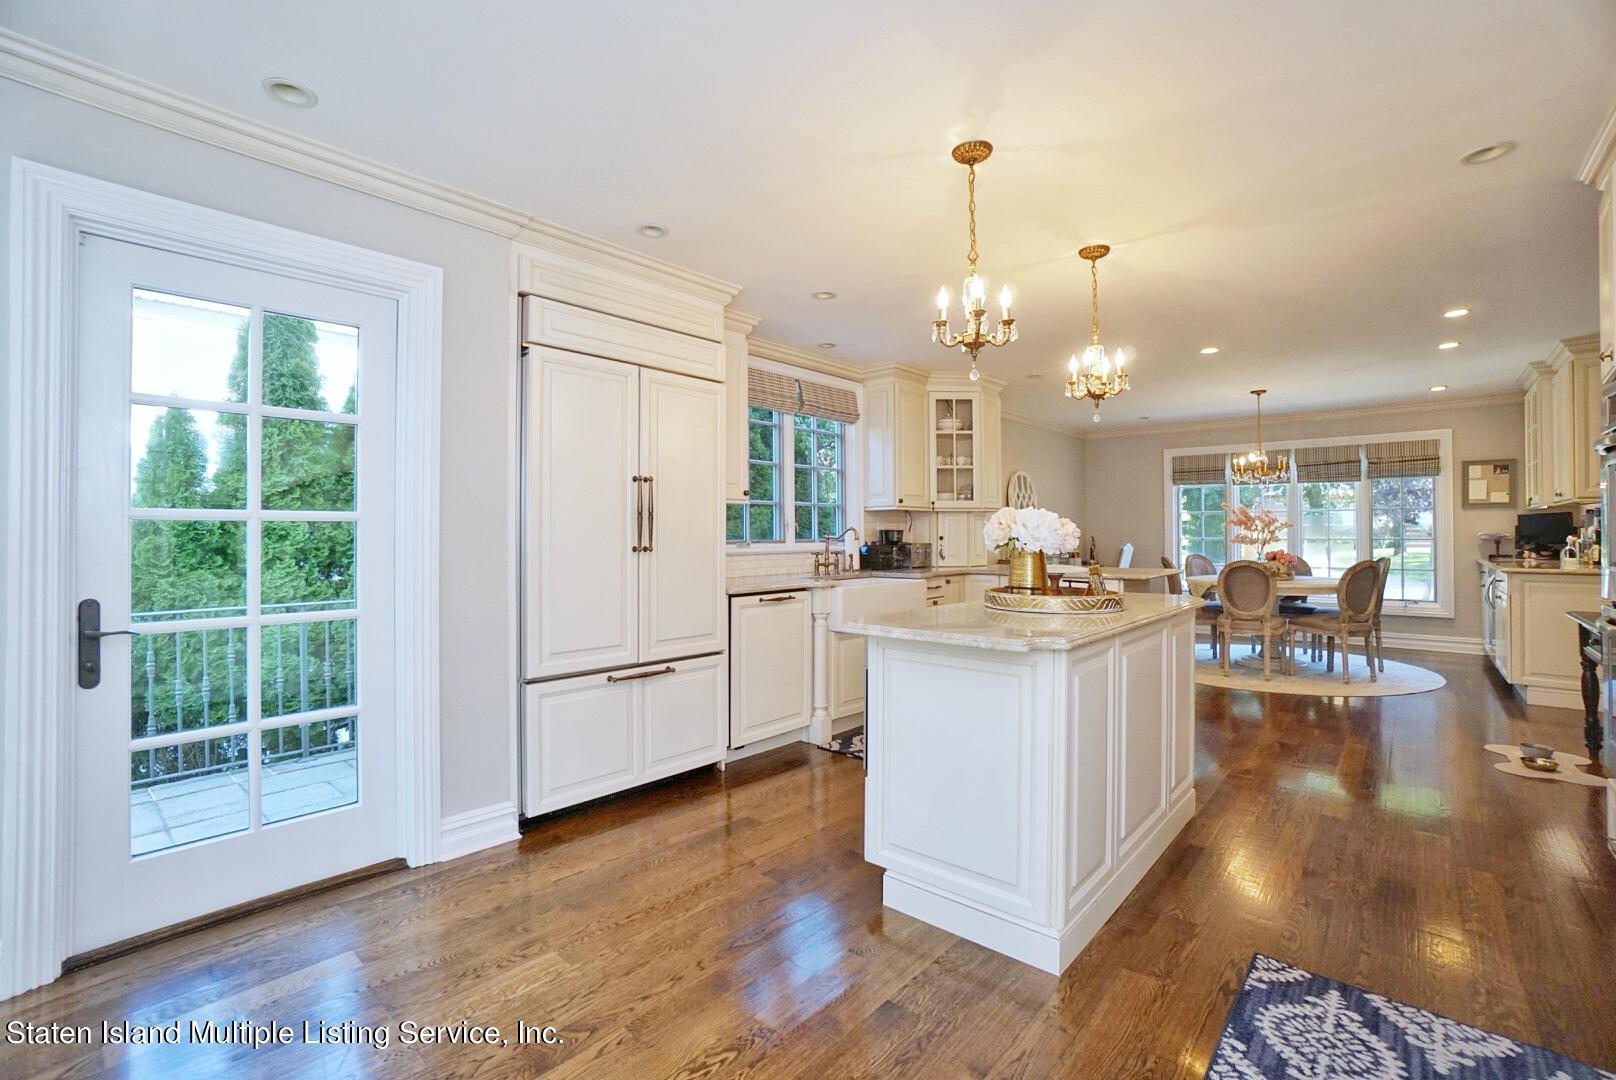 Single Family - Detached 116 Fine Blvd   Staten Island, NY 10314, MLS-1148291-25